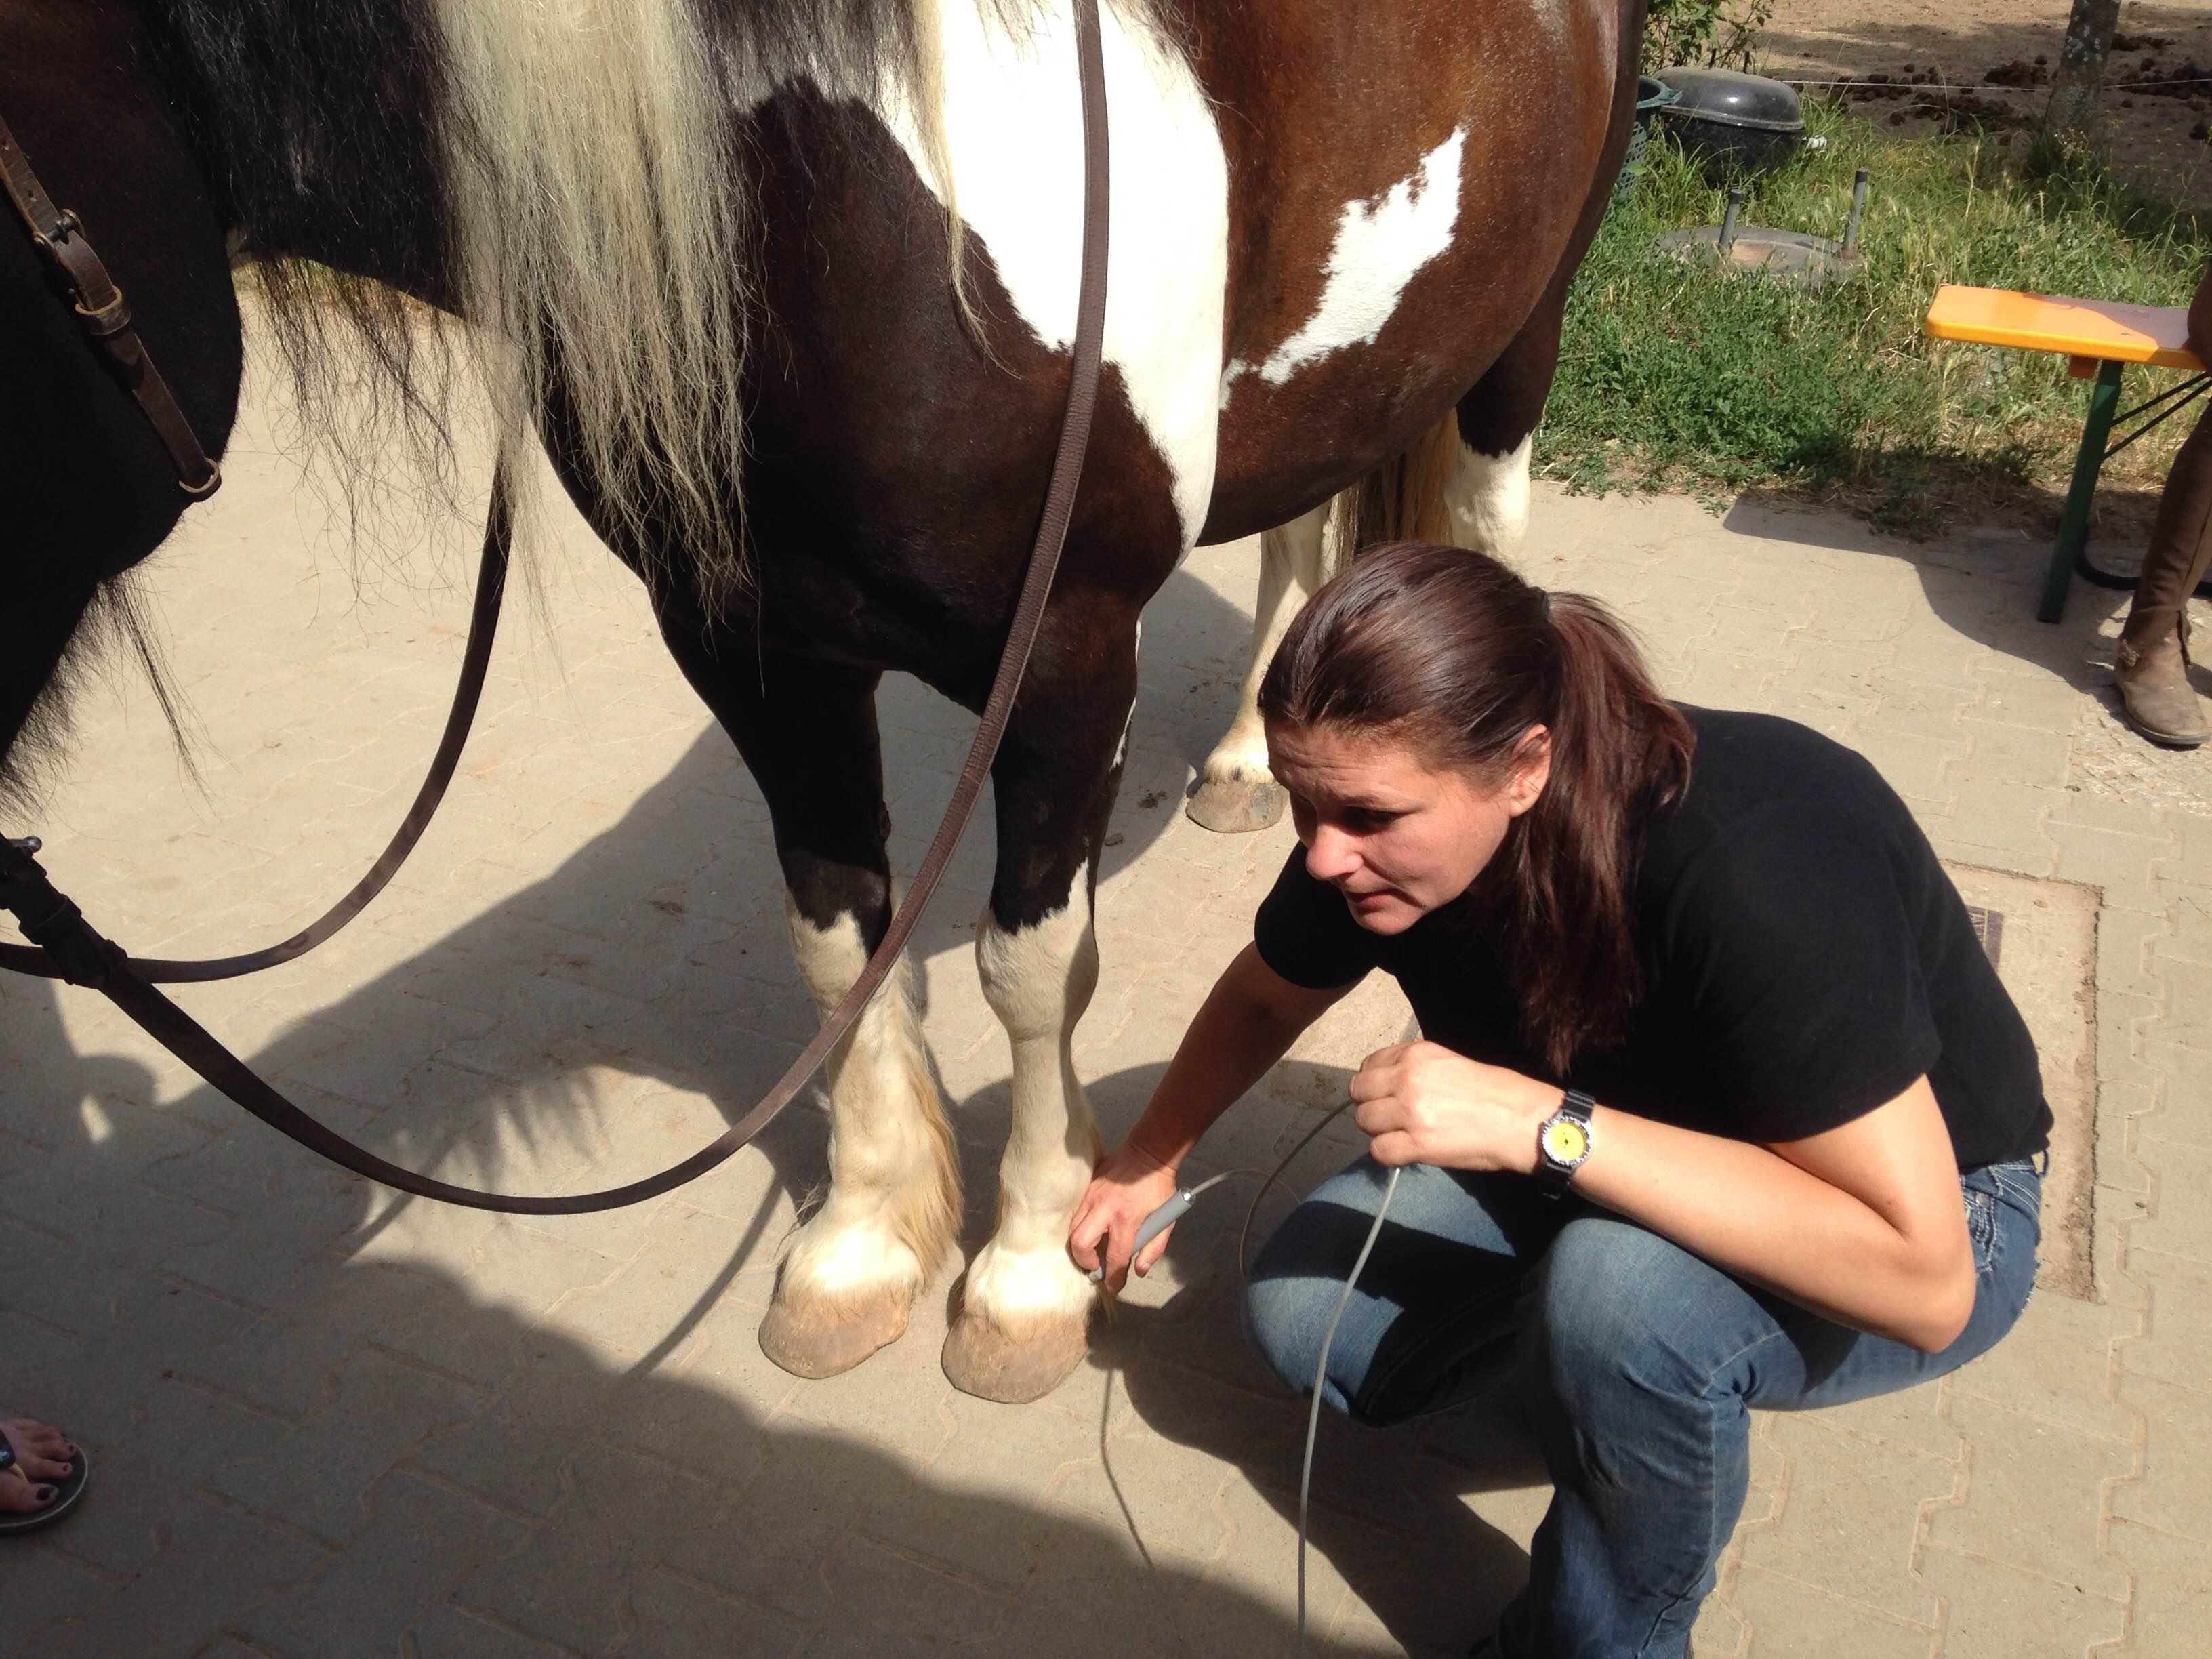 pferd immunsystem stärken